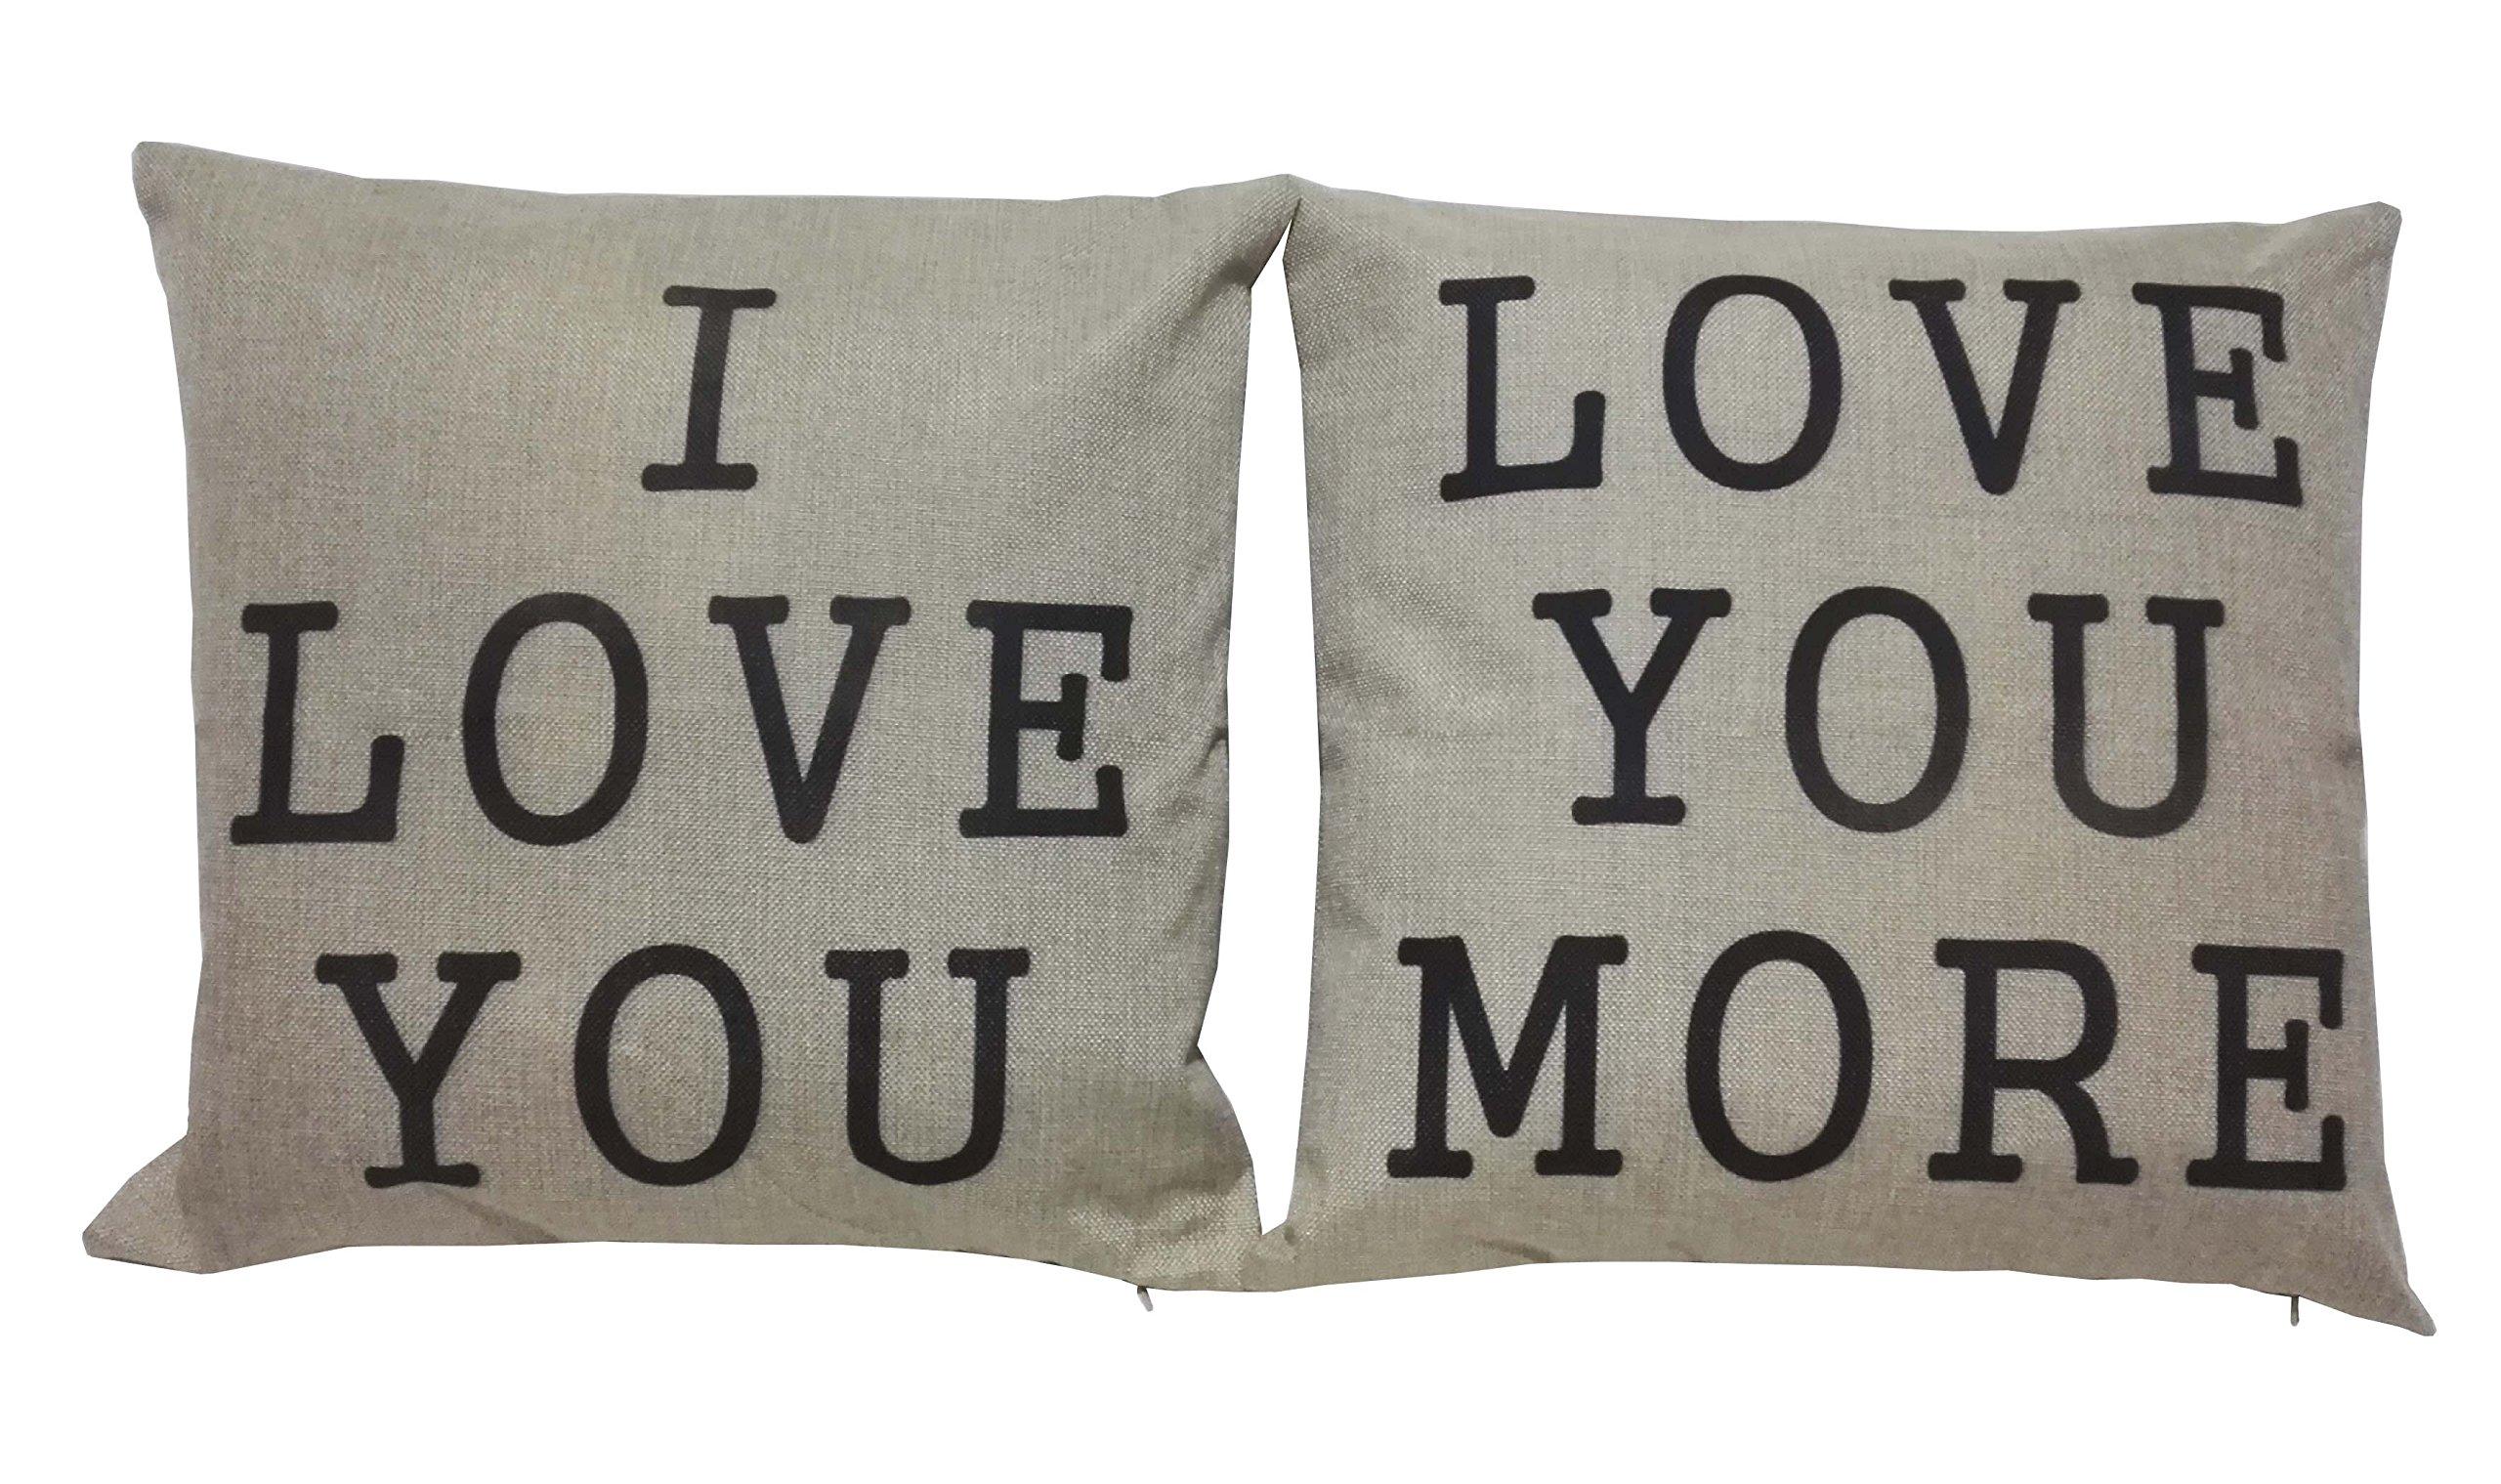 Lydealife (TM)18 X 18'' Cotton Linen Decorative Couple Throw Pillow Cover Cushion Case Couple Pillow Case, Set of 2 - I Love You & Love you More LD094